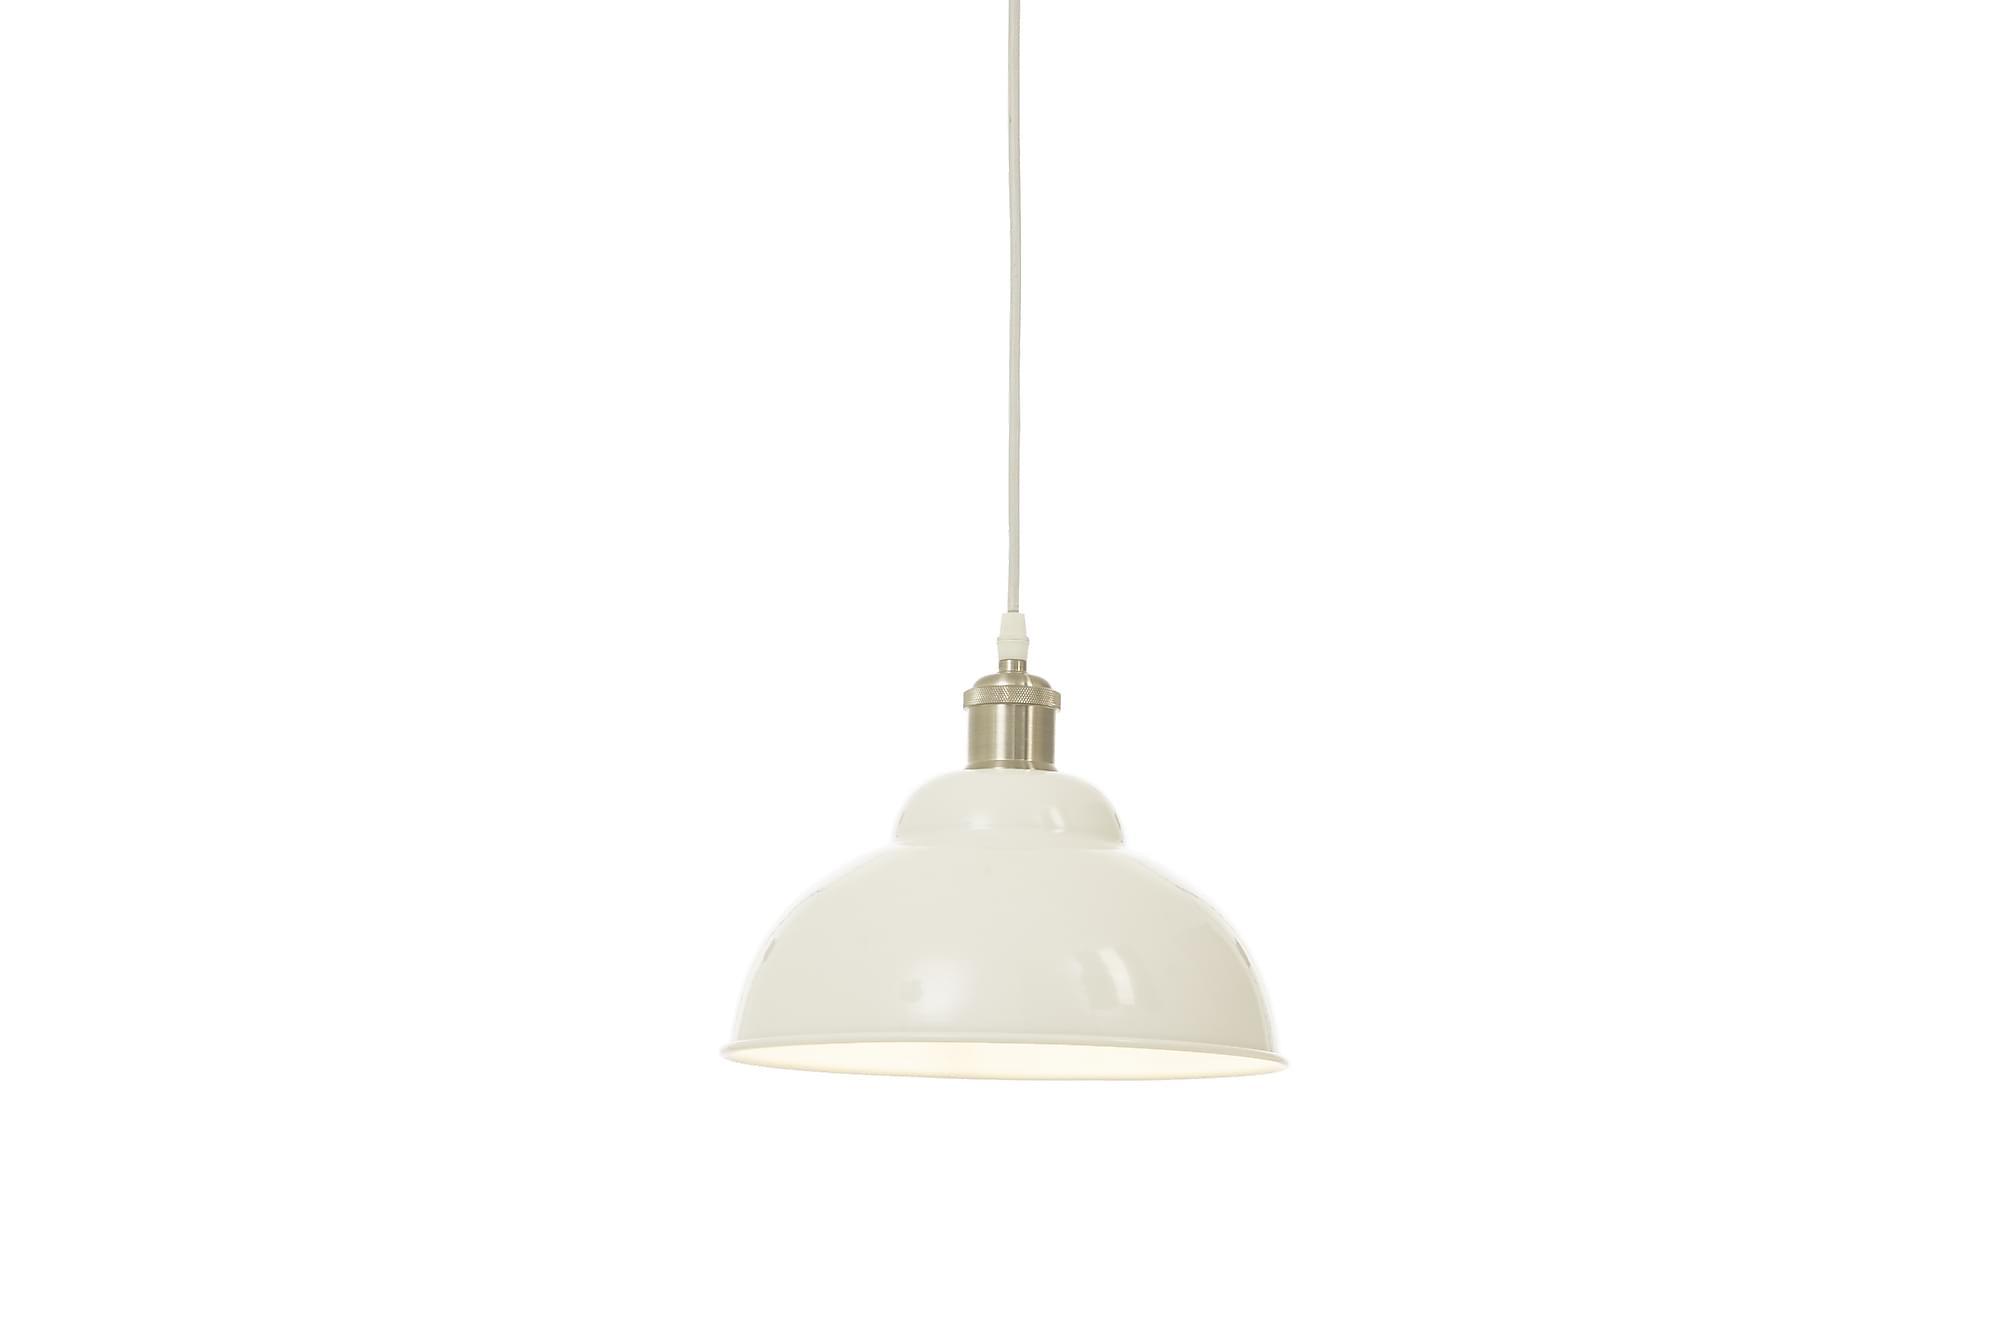 BONNIE taklampa 25cm, vit/silver, Lampor